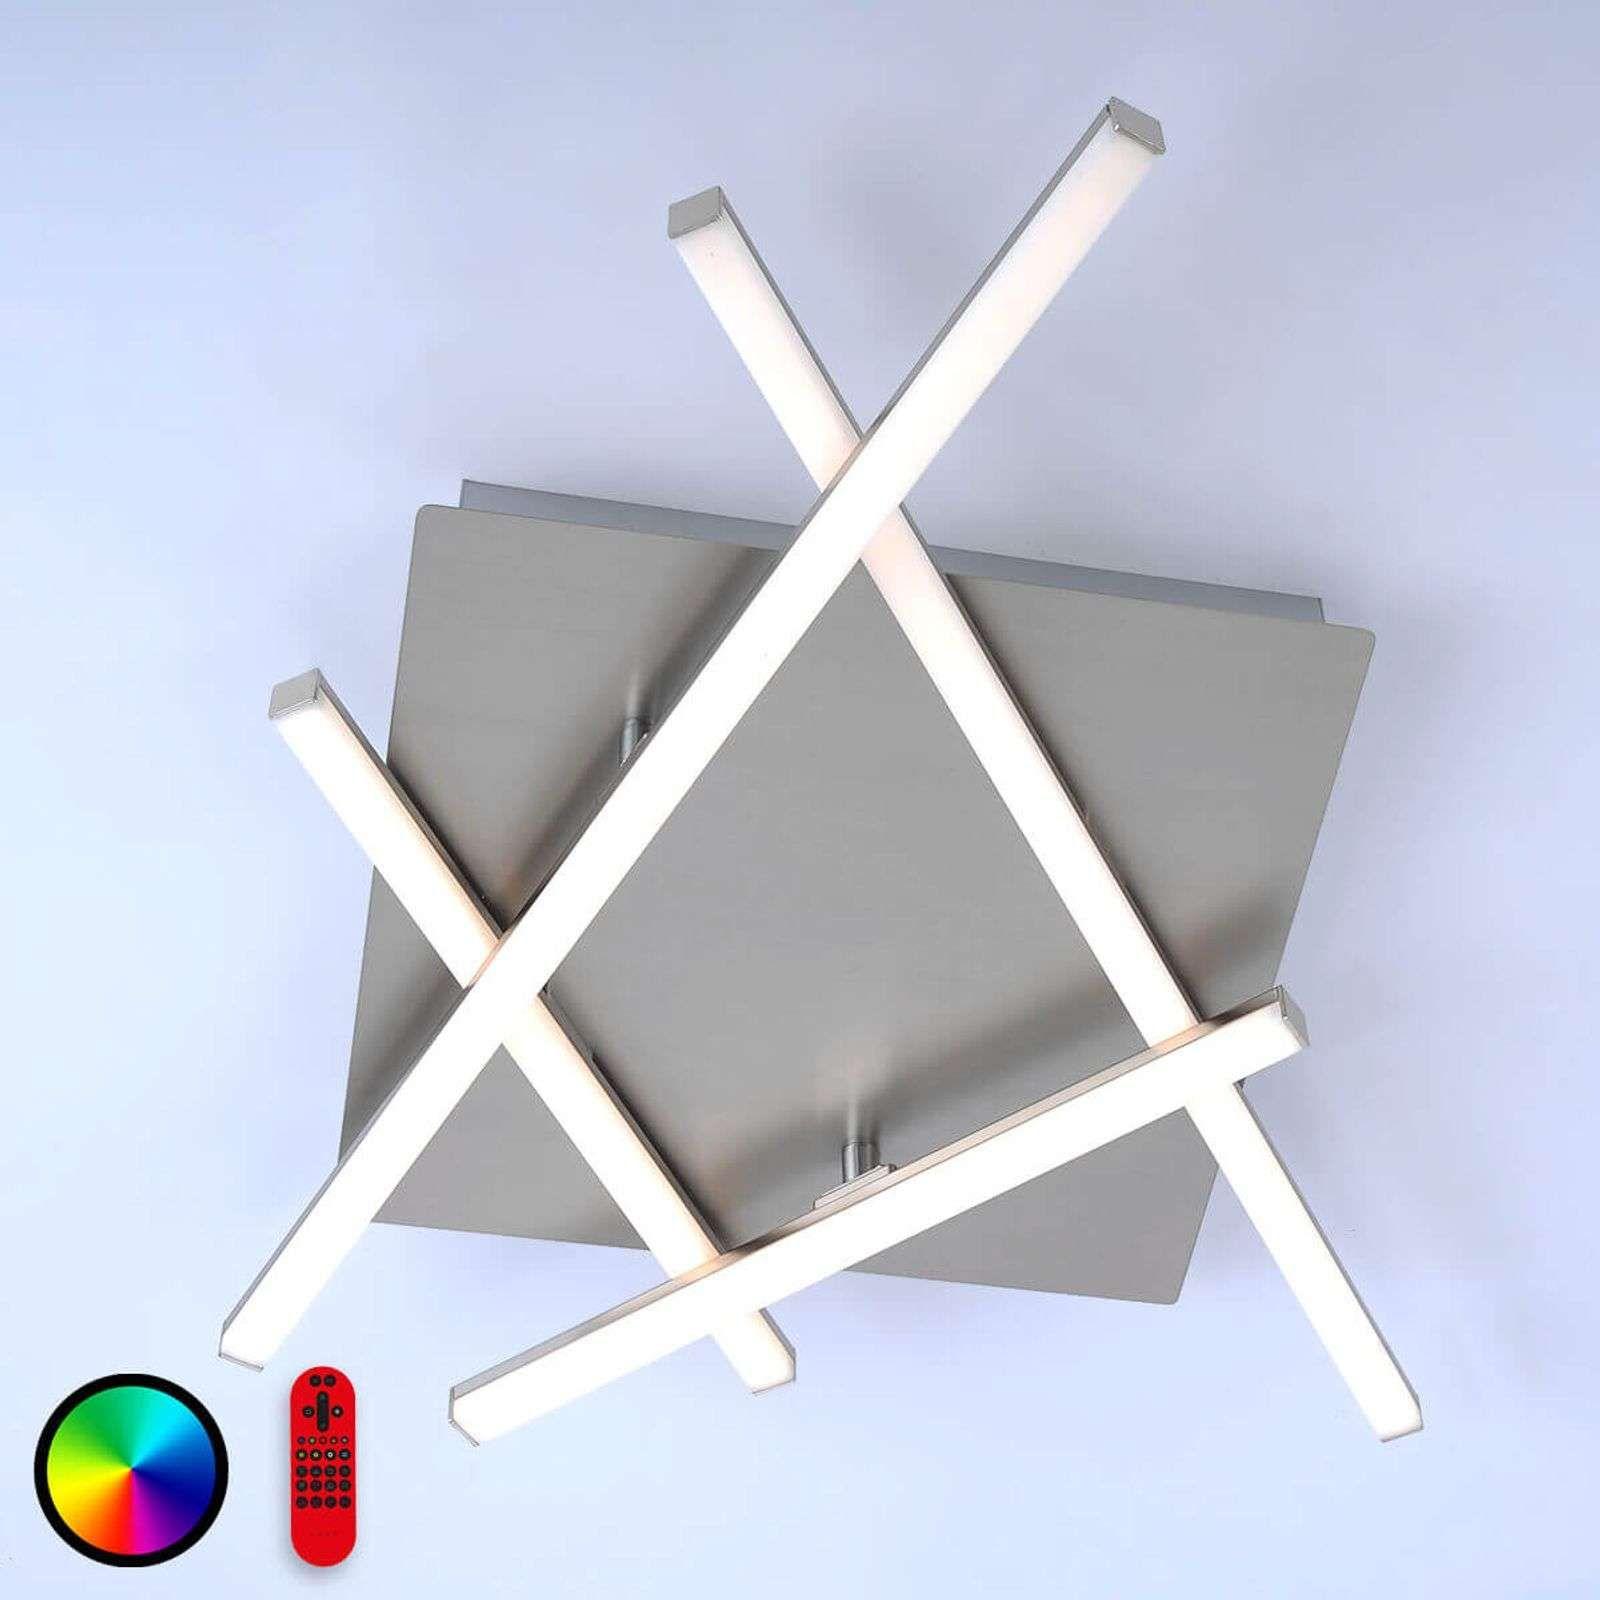 Led Tischleuchte Dimmbar Einbauleuchte Gu10 Ip44 Spot Lampe Holz Led Strahlerbalken 6 Flammi In 2020 Led Deckenleuchte Led Deckenleuchte Dimmbar Led Deckenlampen